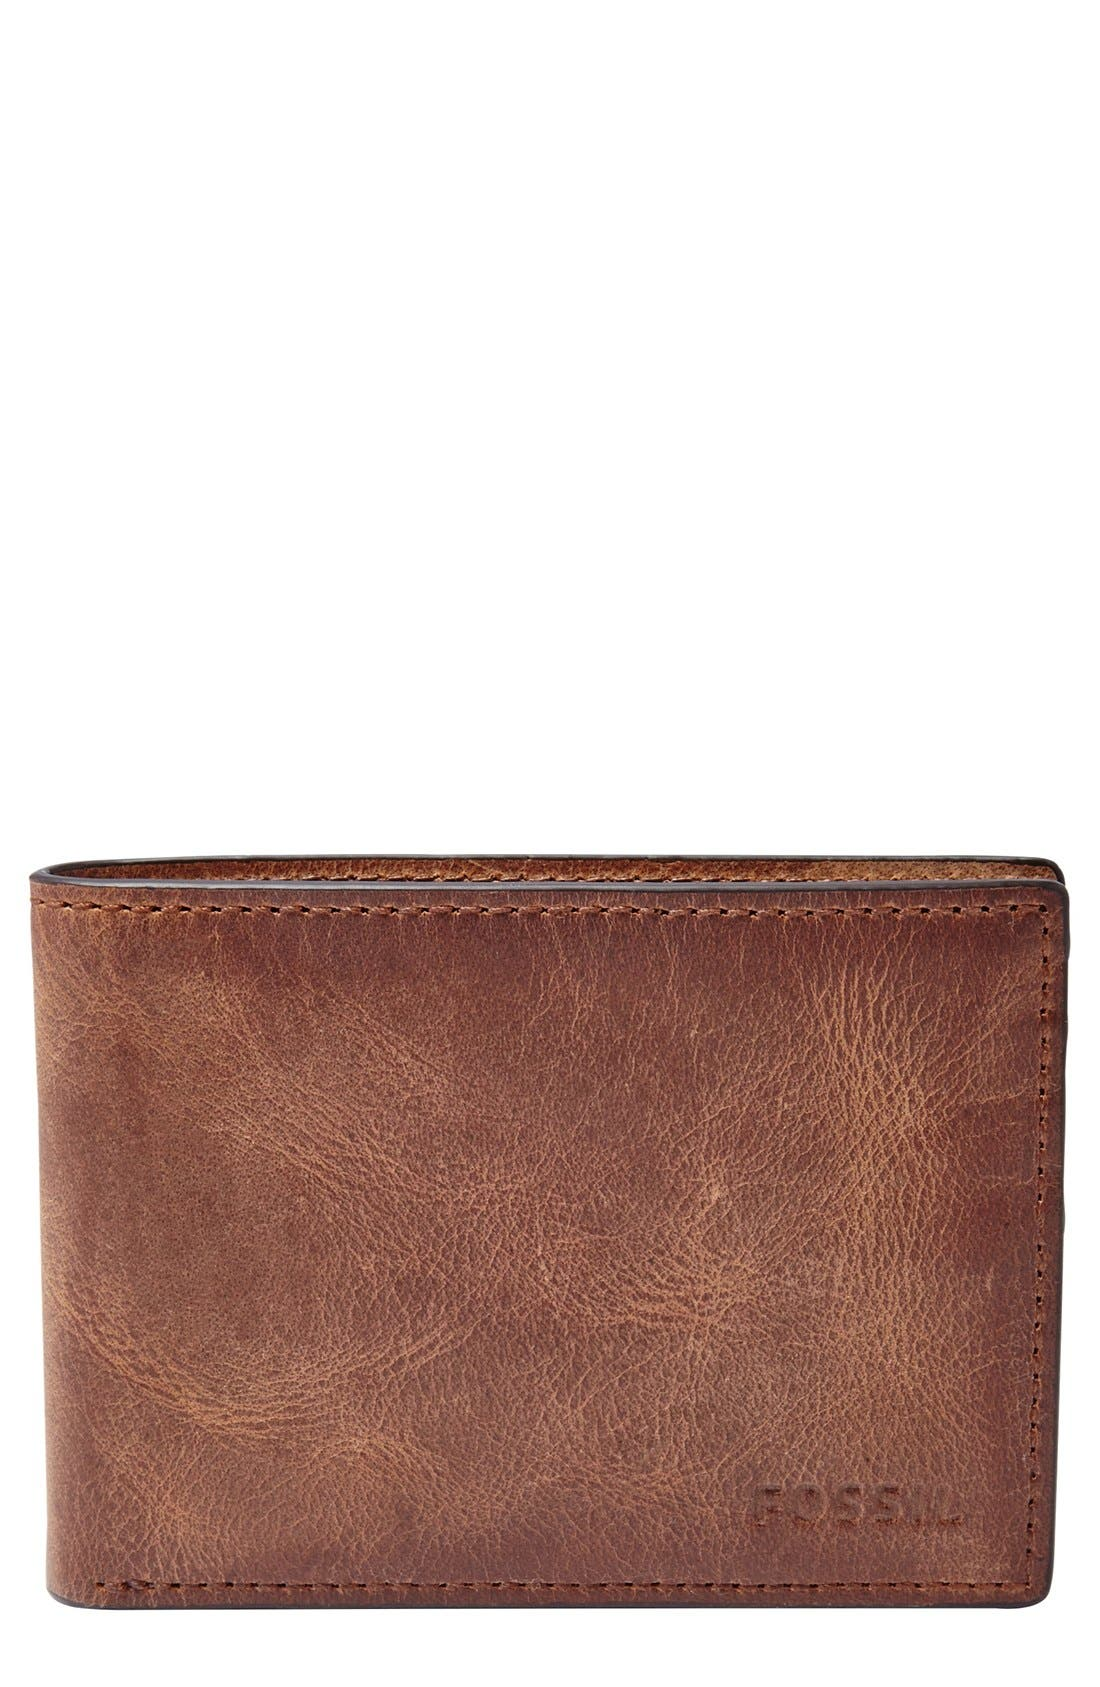 Alternate Image 1 Selected - Fossil 'Derrick' Leather Front Pocket Bifold Wallet